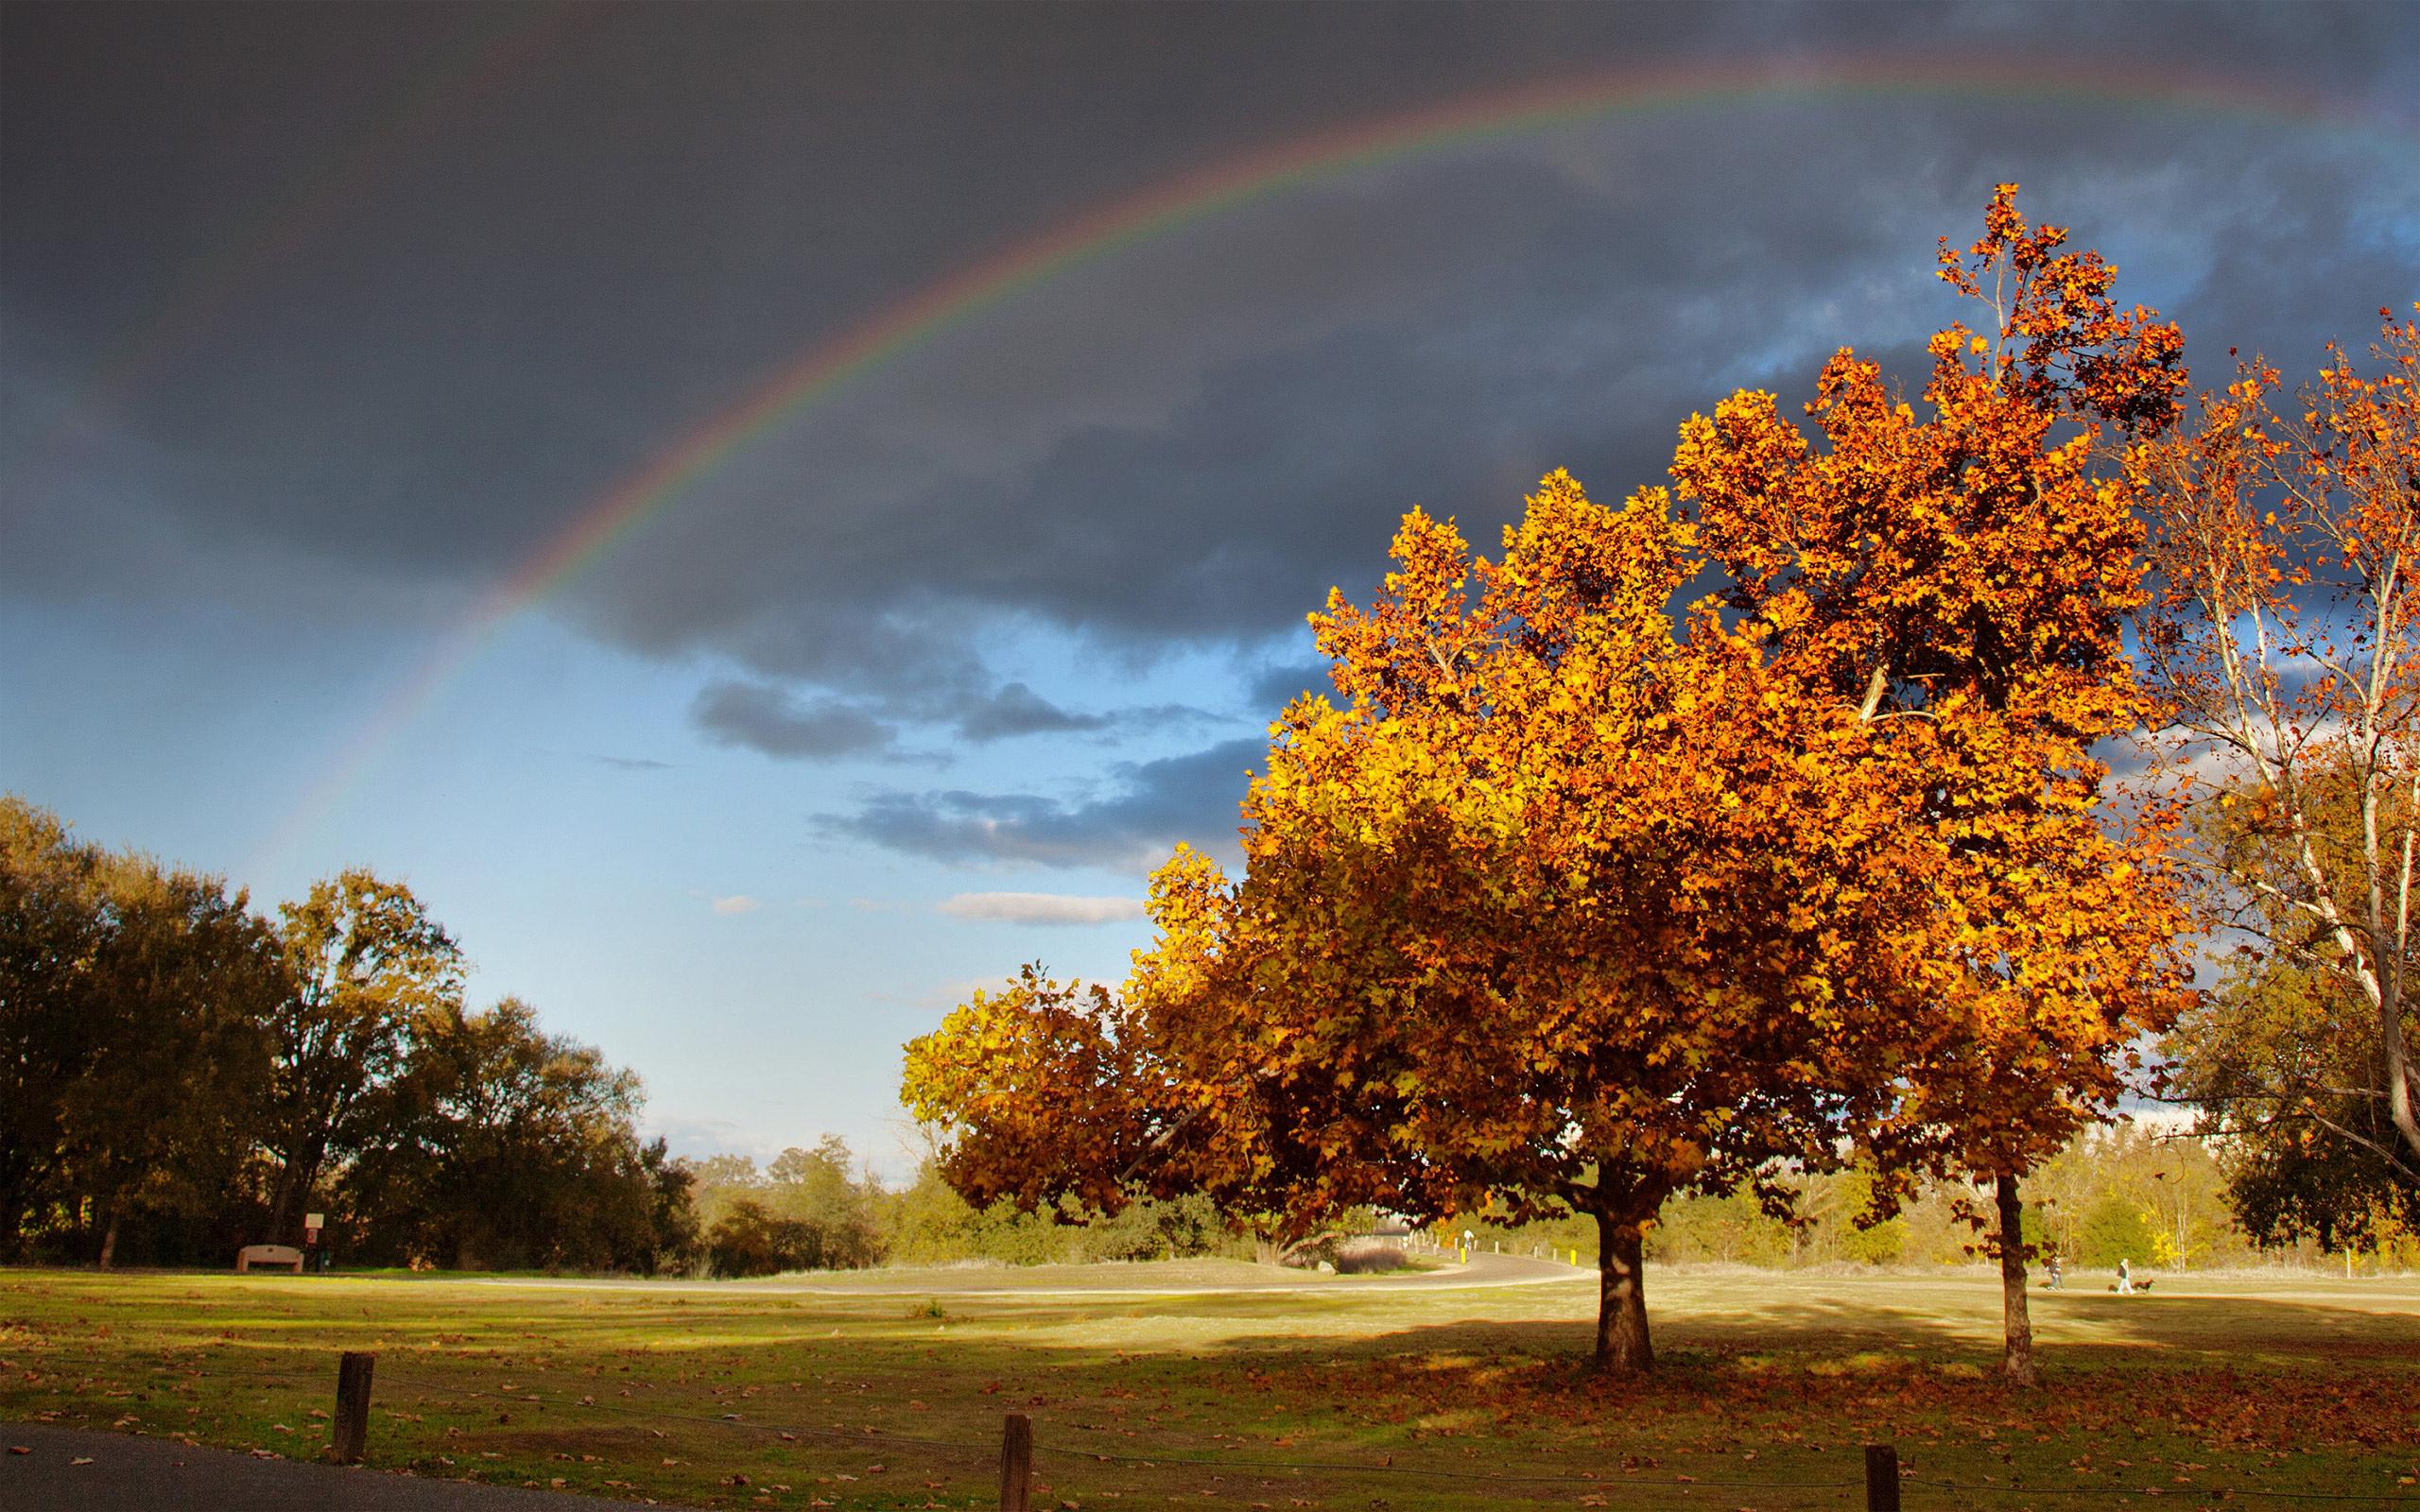 Free Fall Wallpaper With Animals Autumn Rainbow Wallpaper Hd Desktop Wallpapers 4k Hd